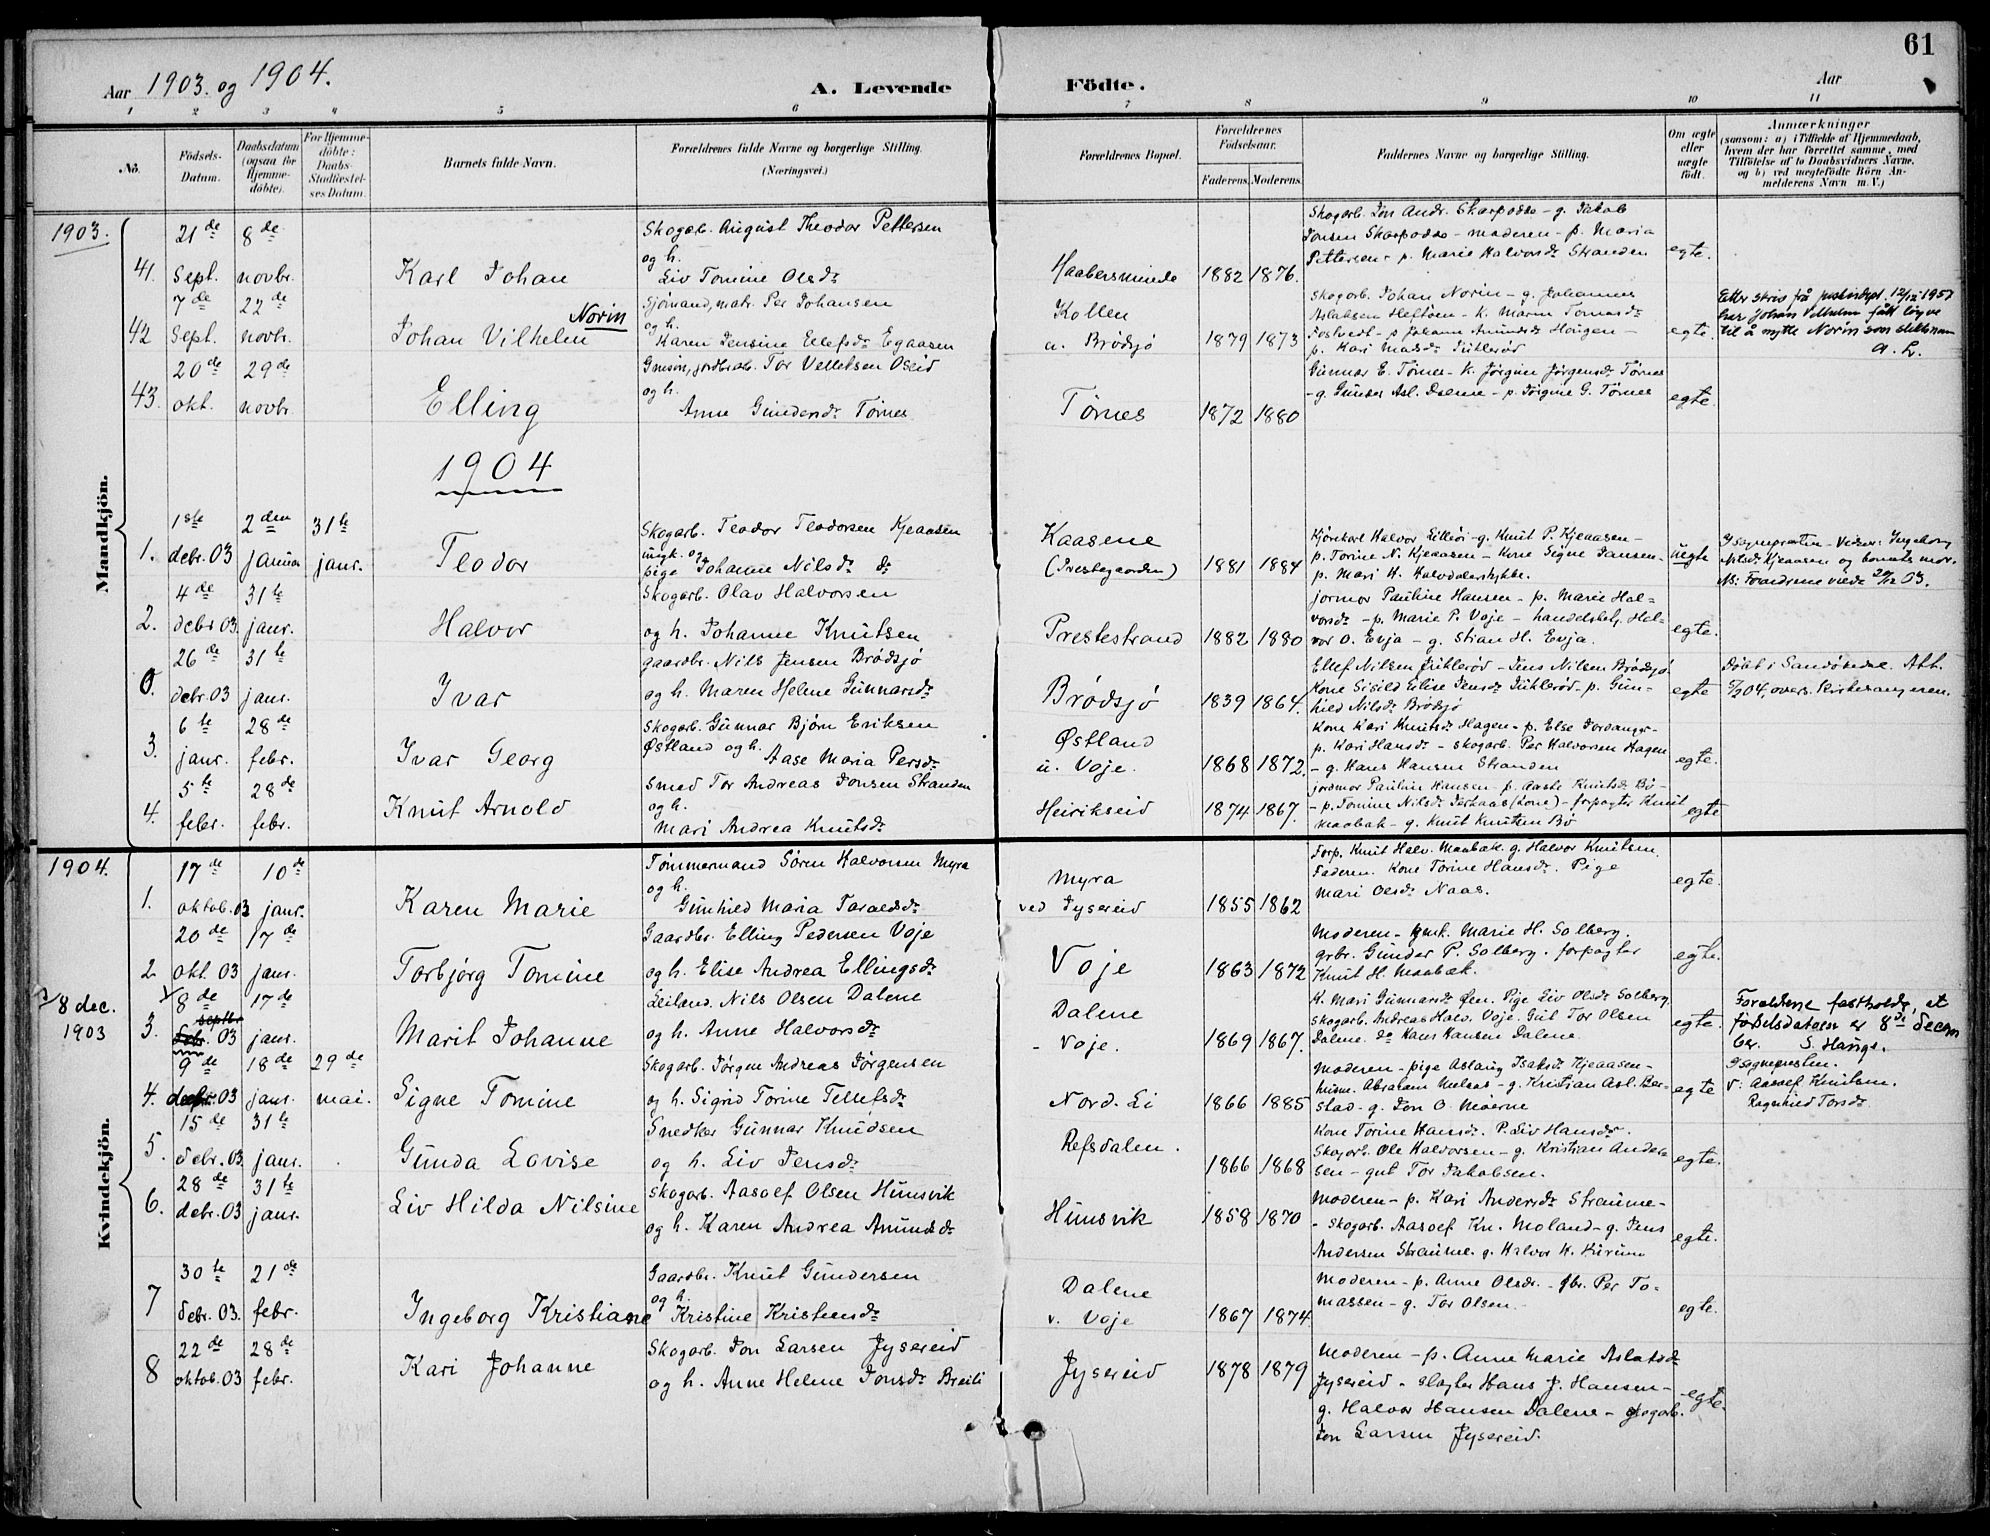 SAKO, Drangedal kirkebøker, F/Fa/L0012: Ministerialbok nr. 12, 1895-1905, s. 61